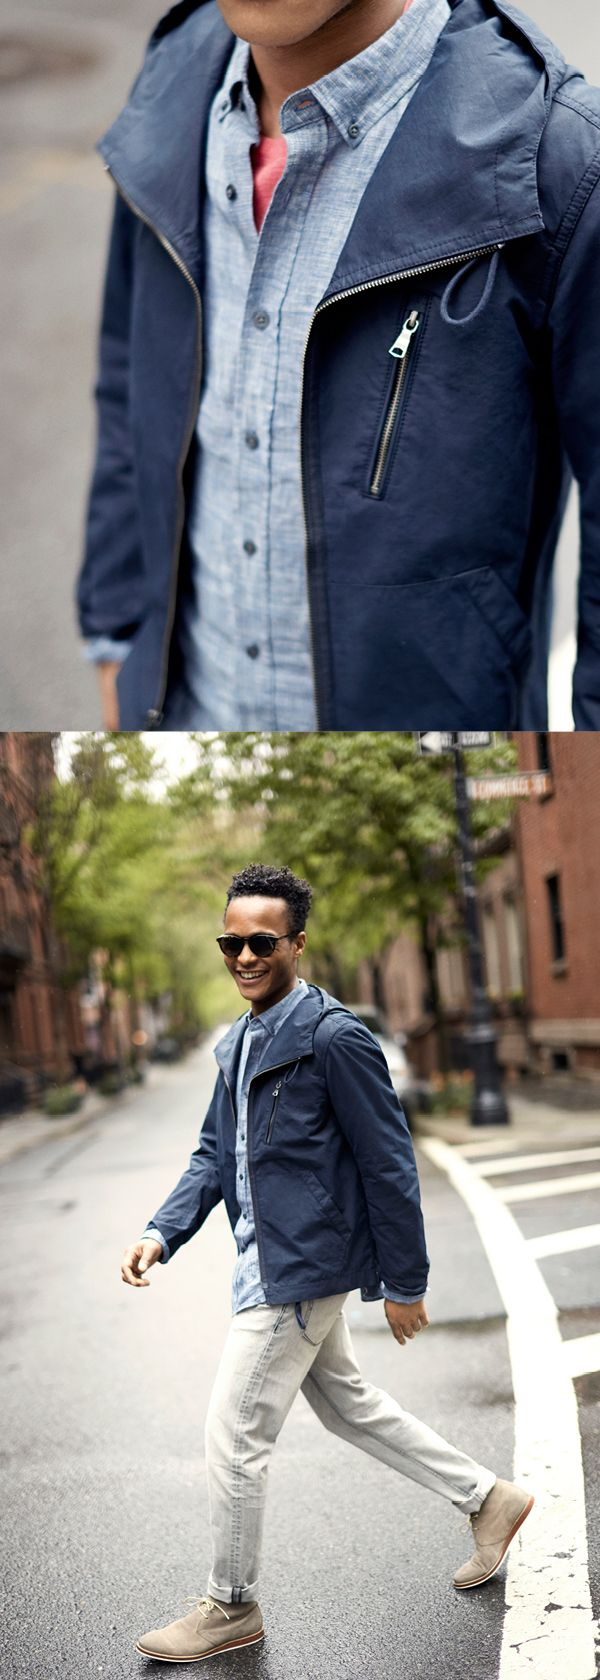 Gangster flannel shirts   best My Style images on Pinterest  Men fashion Gentleman